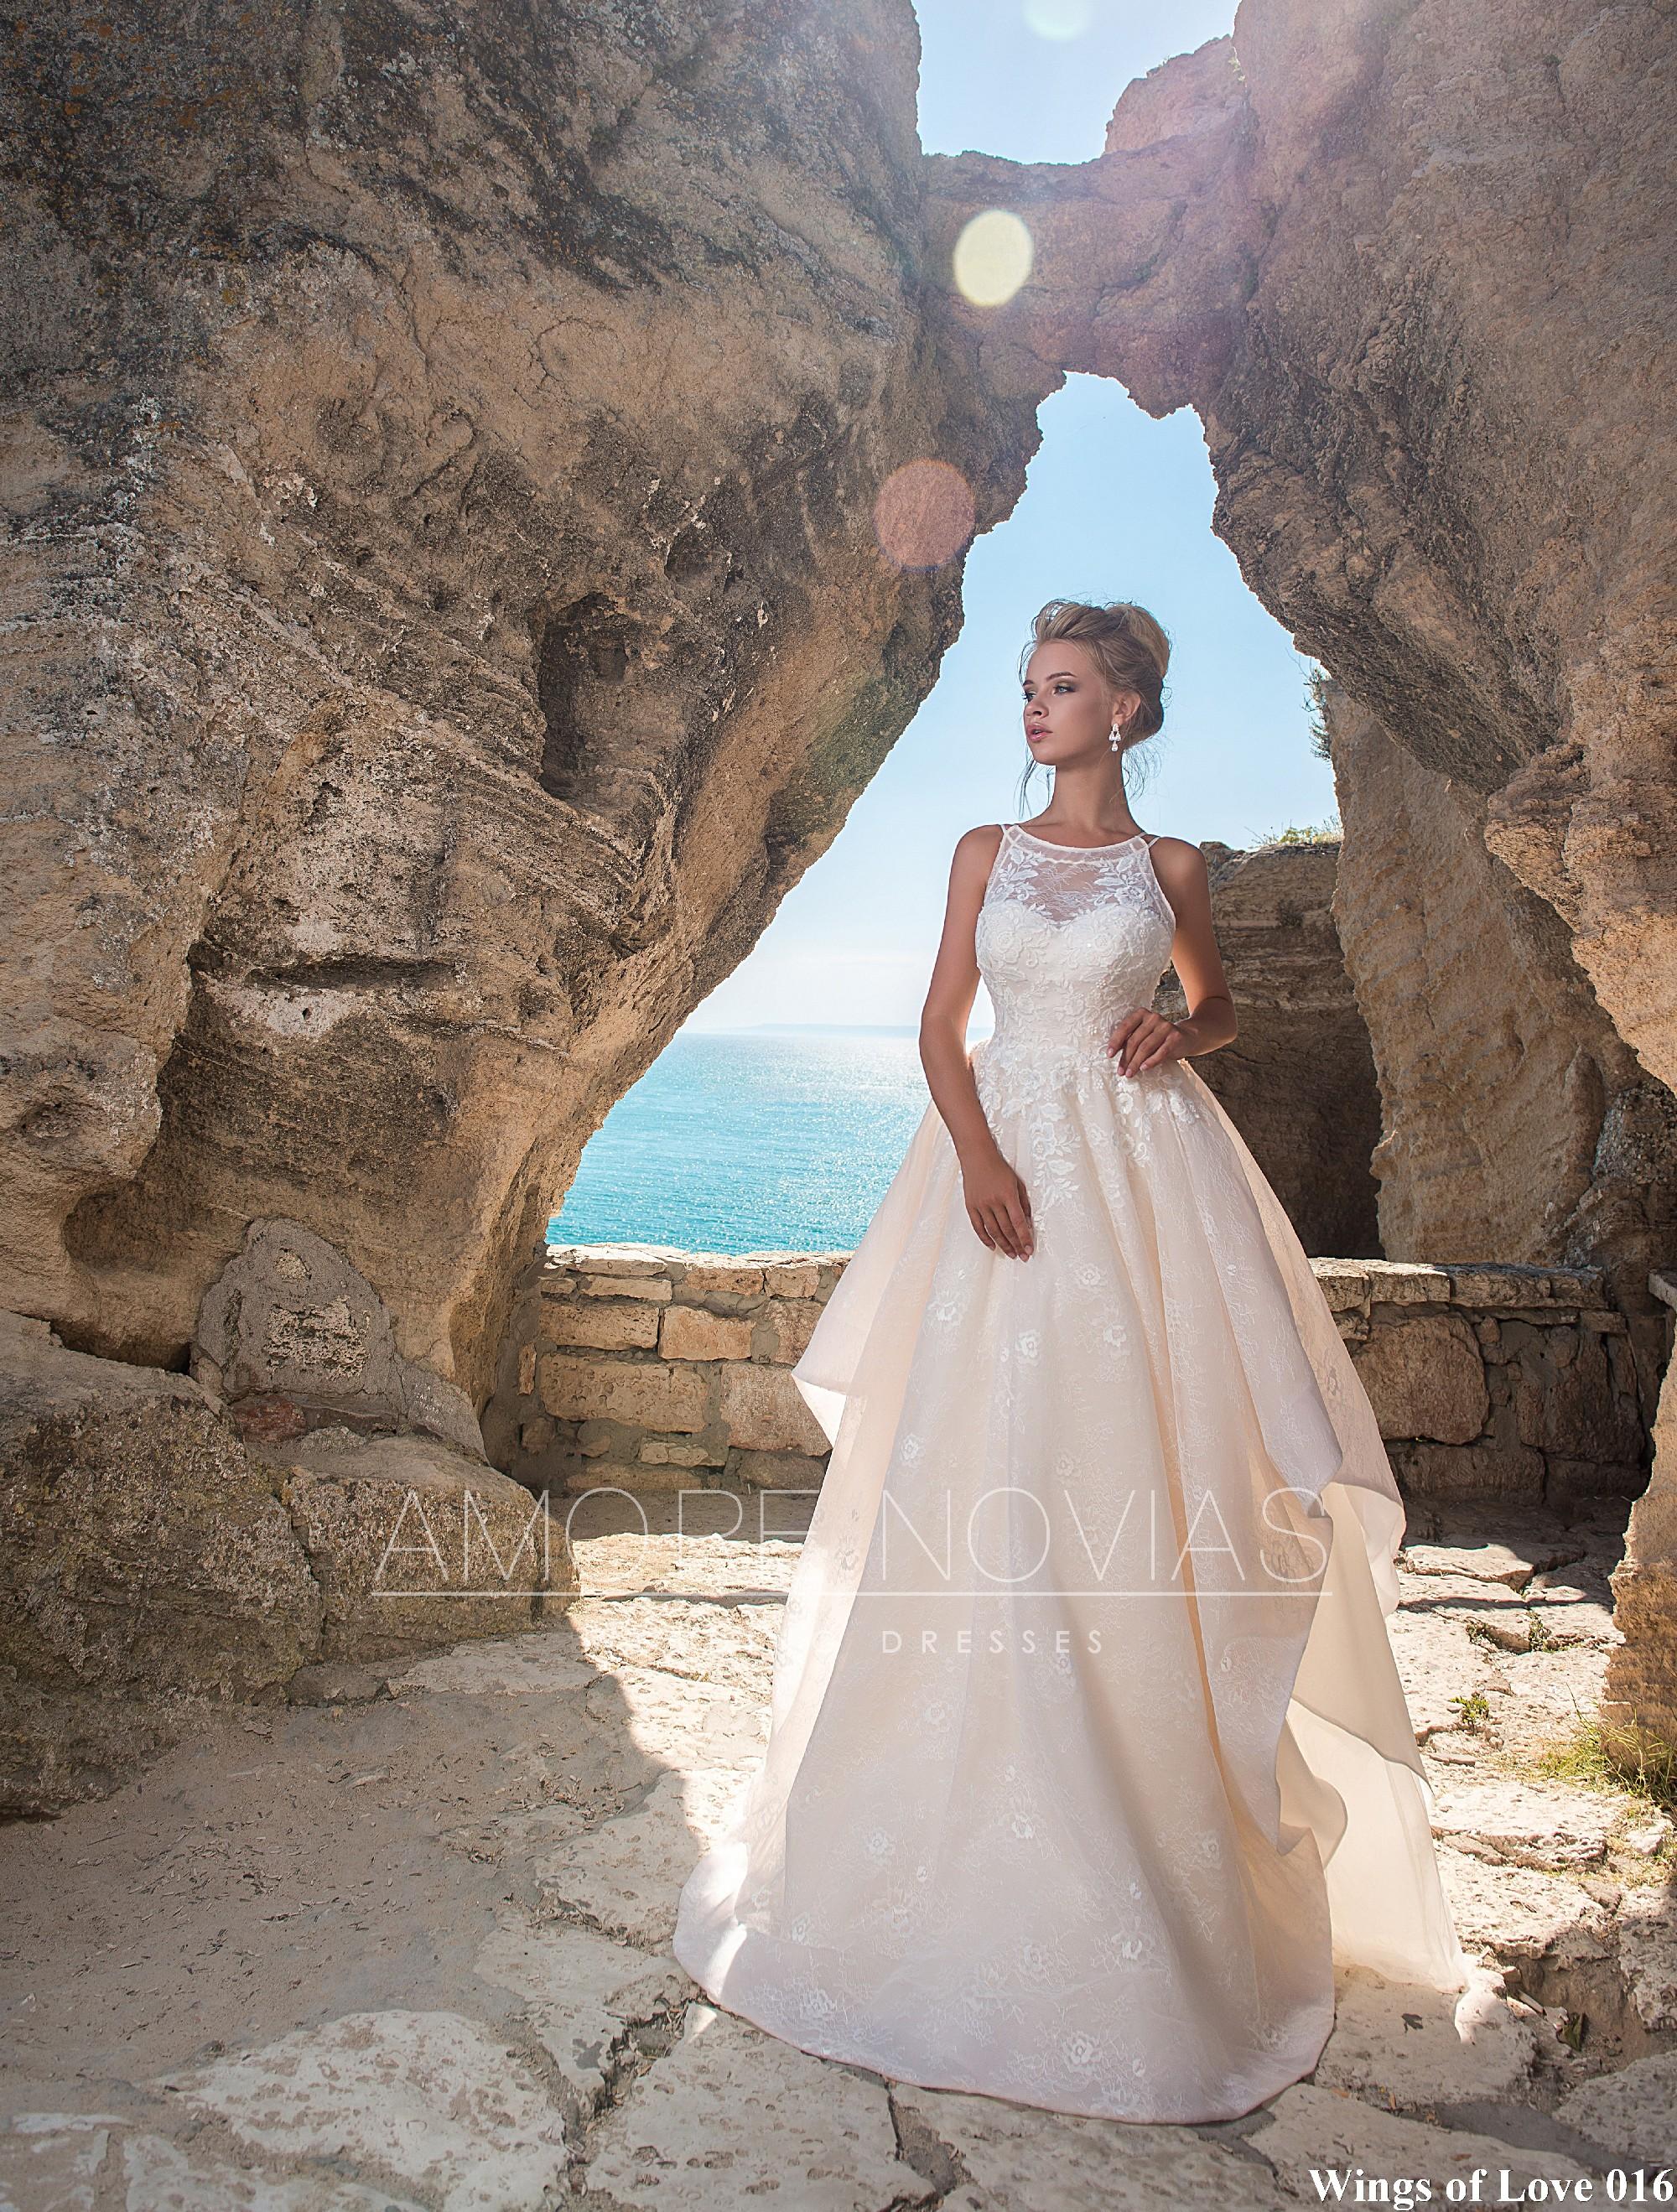 https://amore-novias.com/images/stories/virtuemart/product/lk-016-------(1).jpg